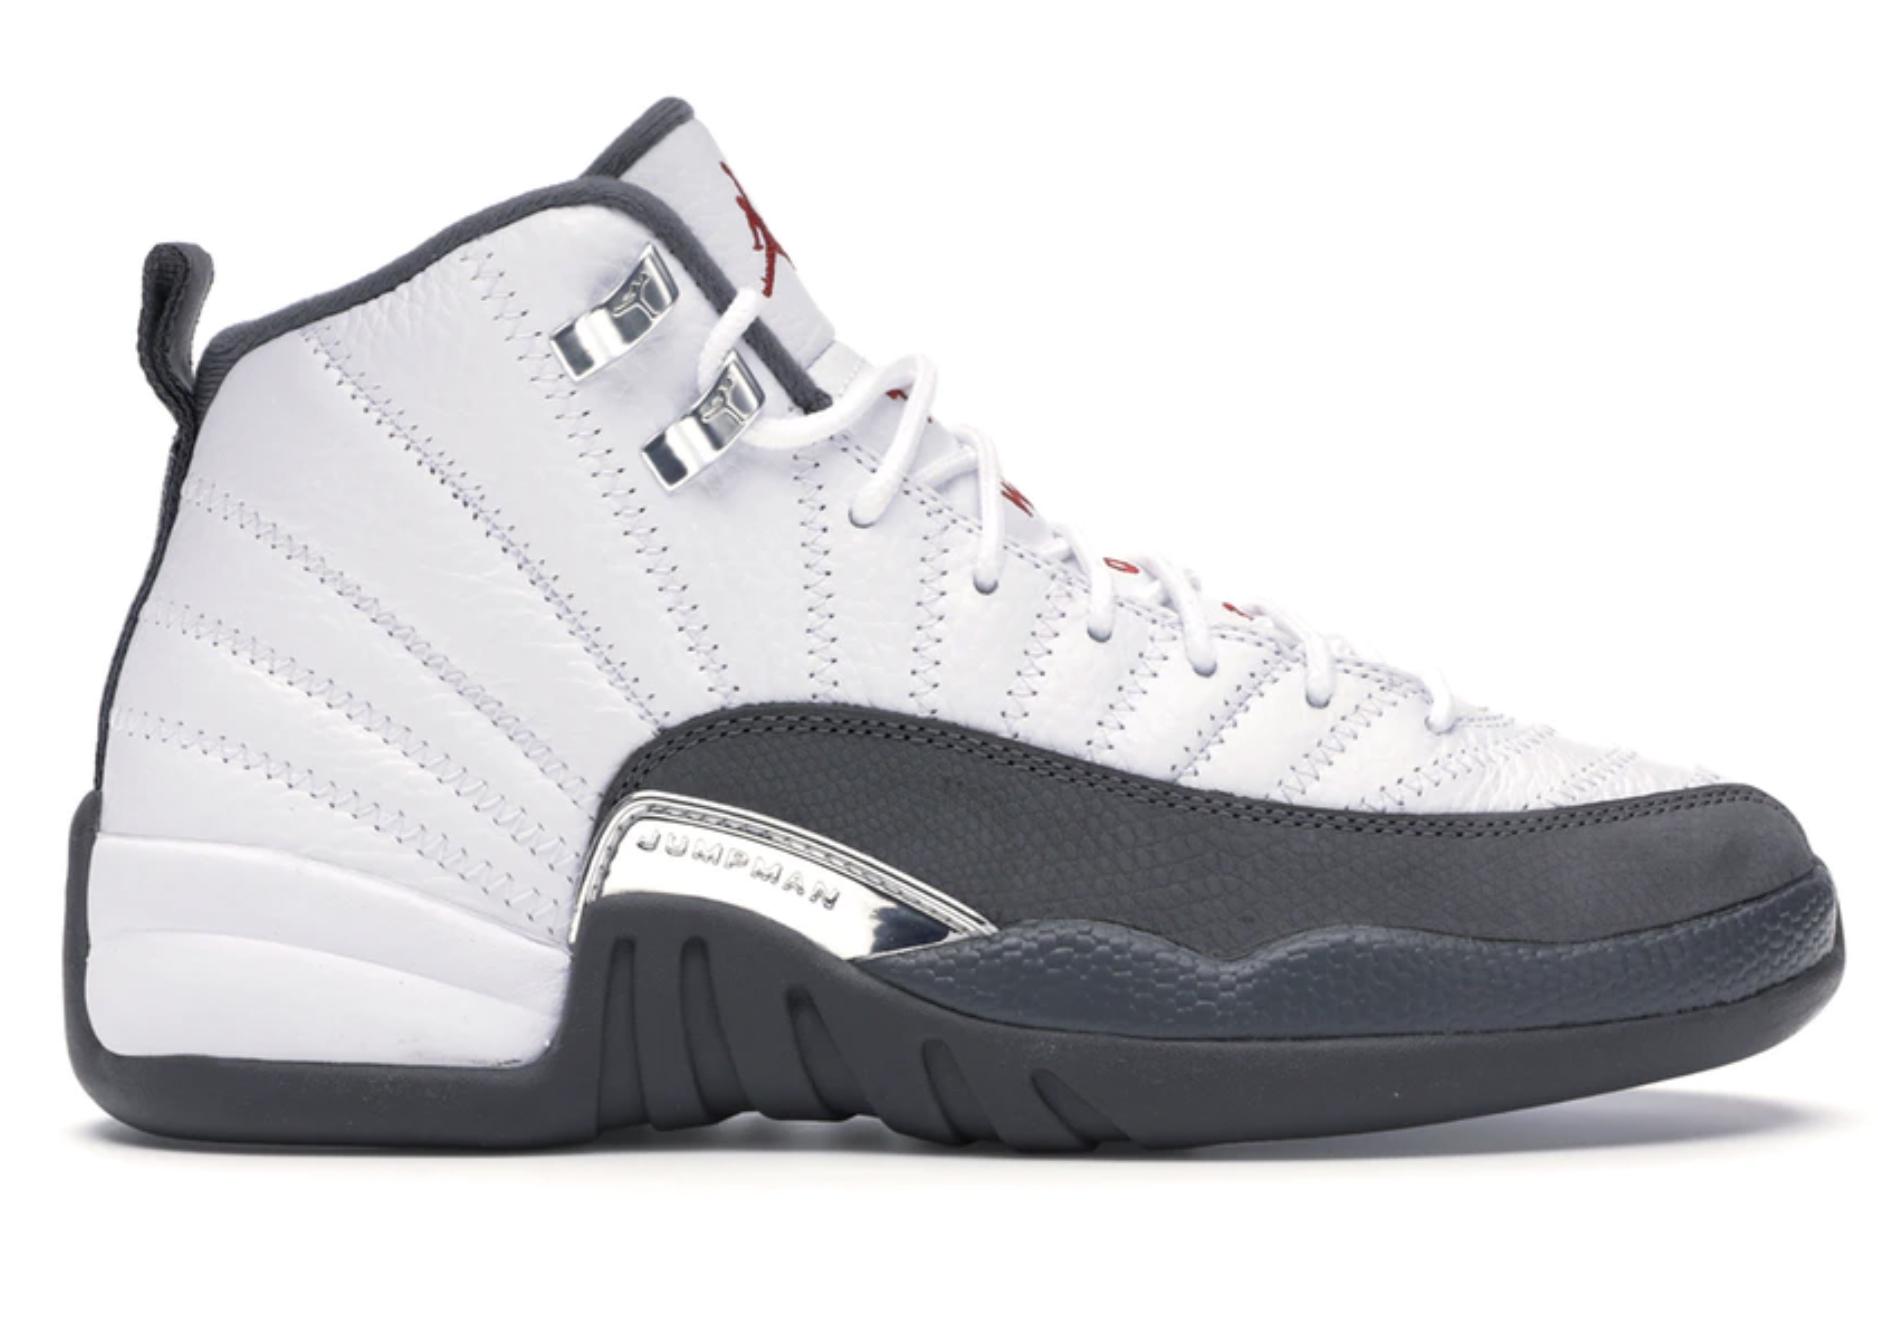 Jordan 12 Retro White Dark Grey (GS